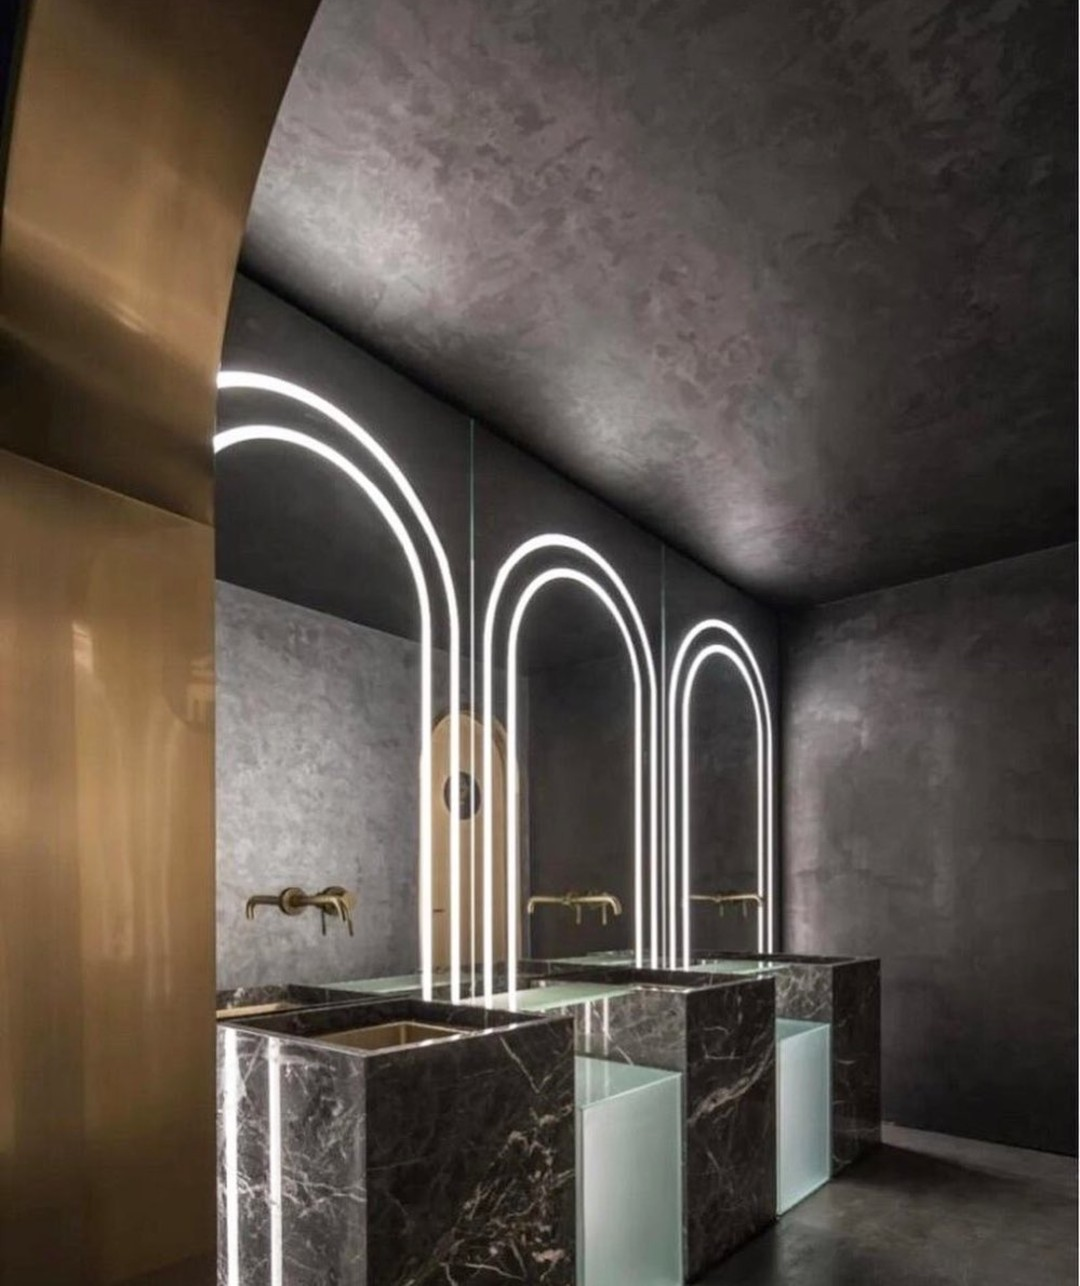 Deco Cemento - Luxury Polished Concrete & Microcement London